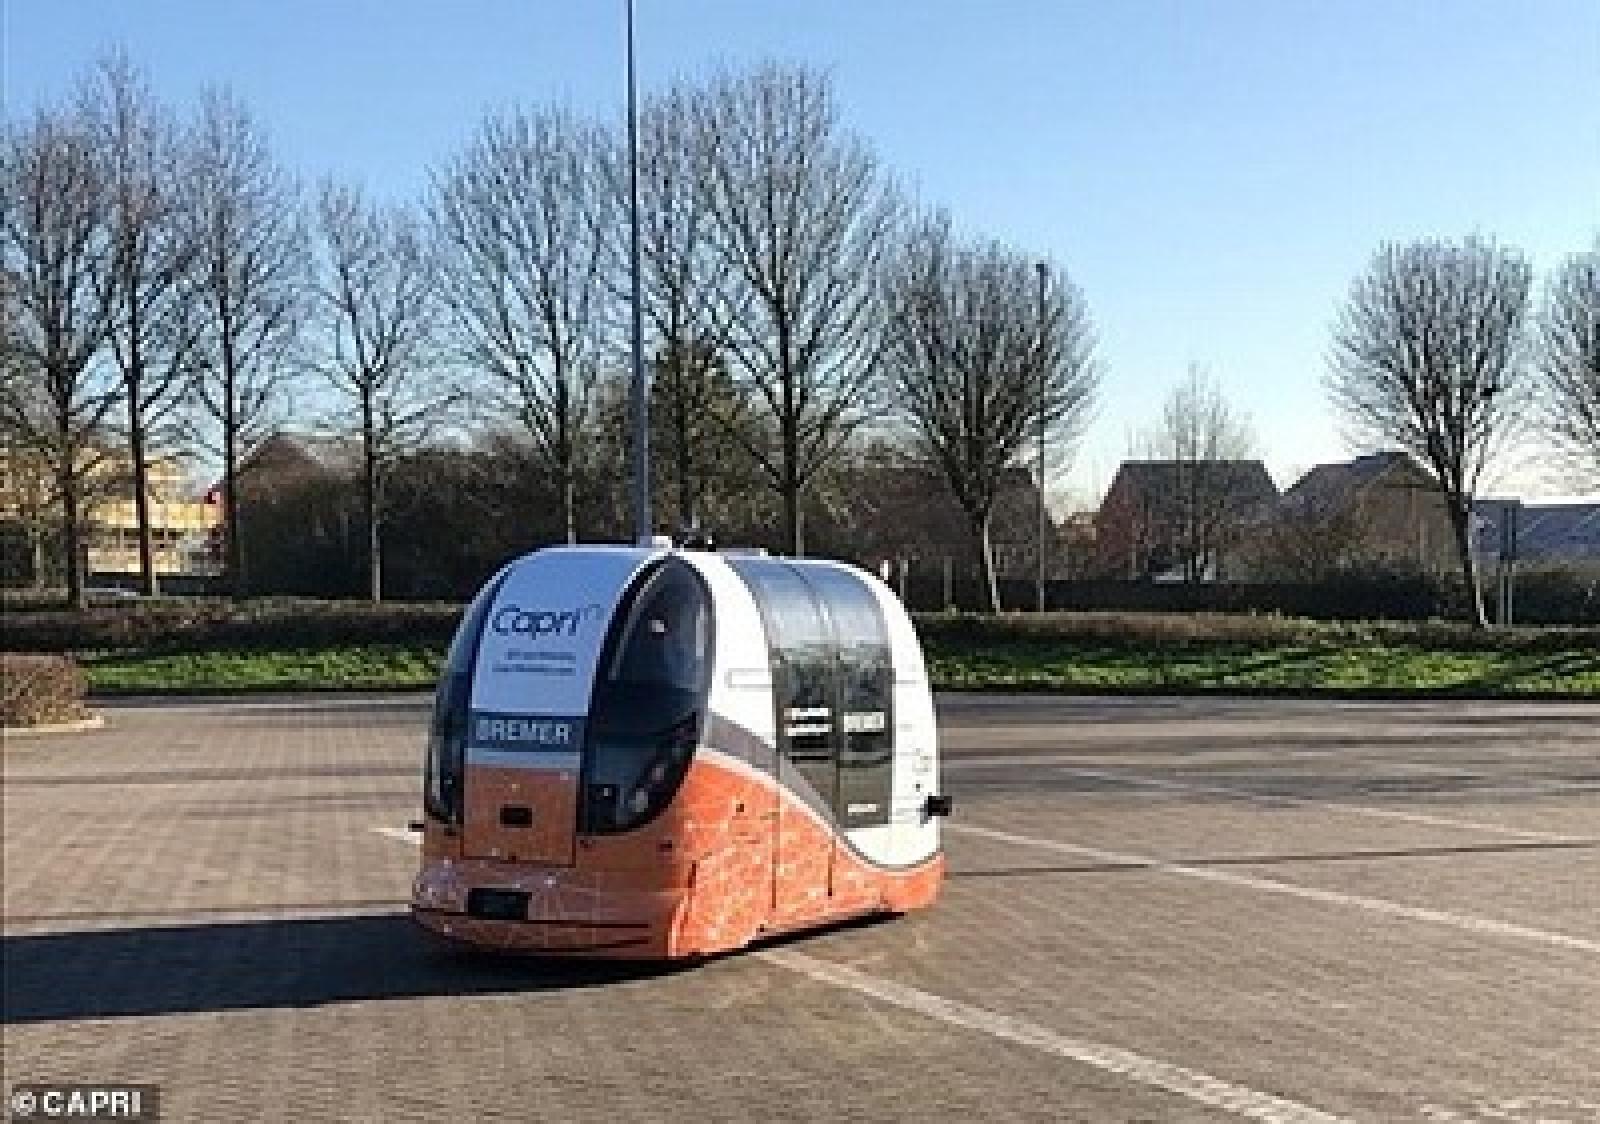 driverless pods transport passengers around a shopping centre